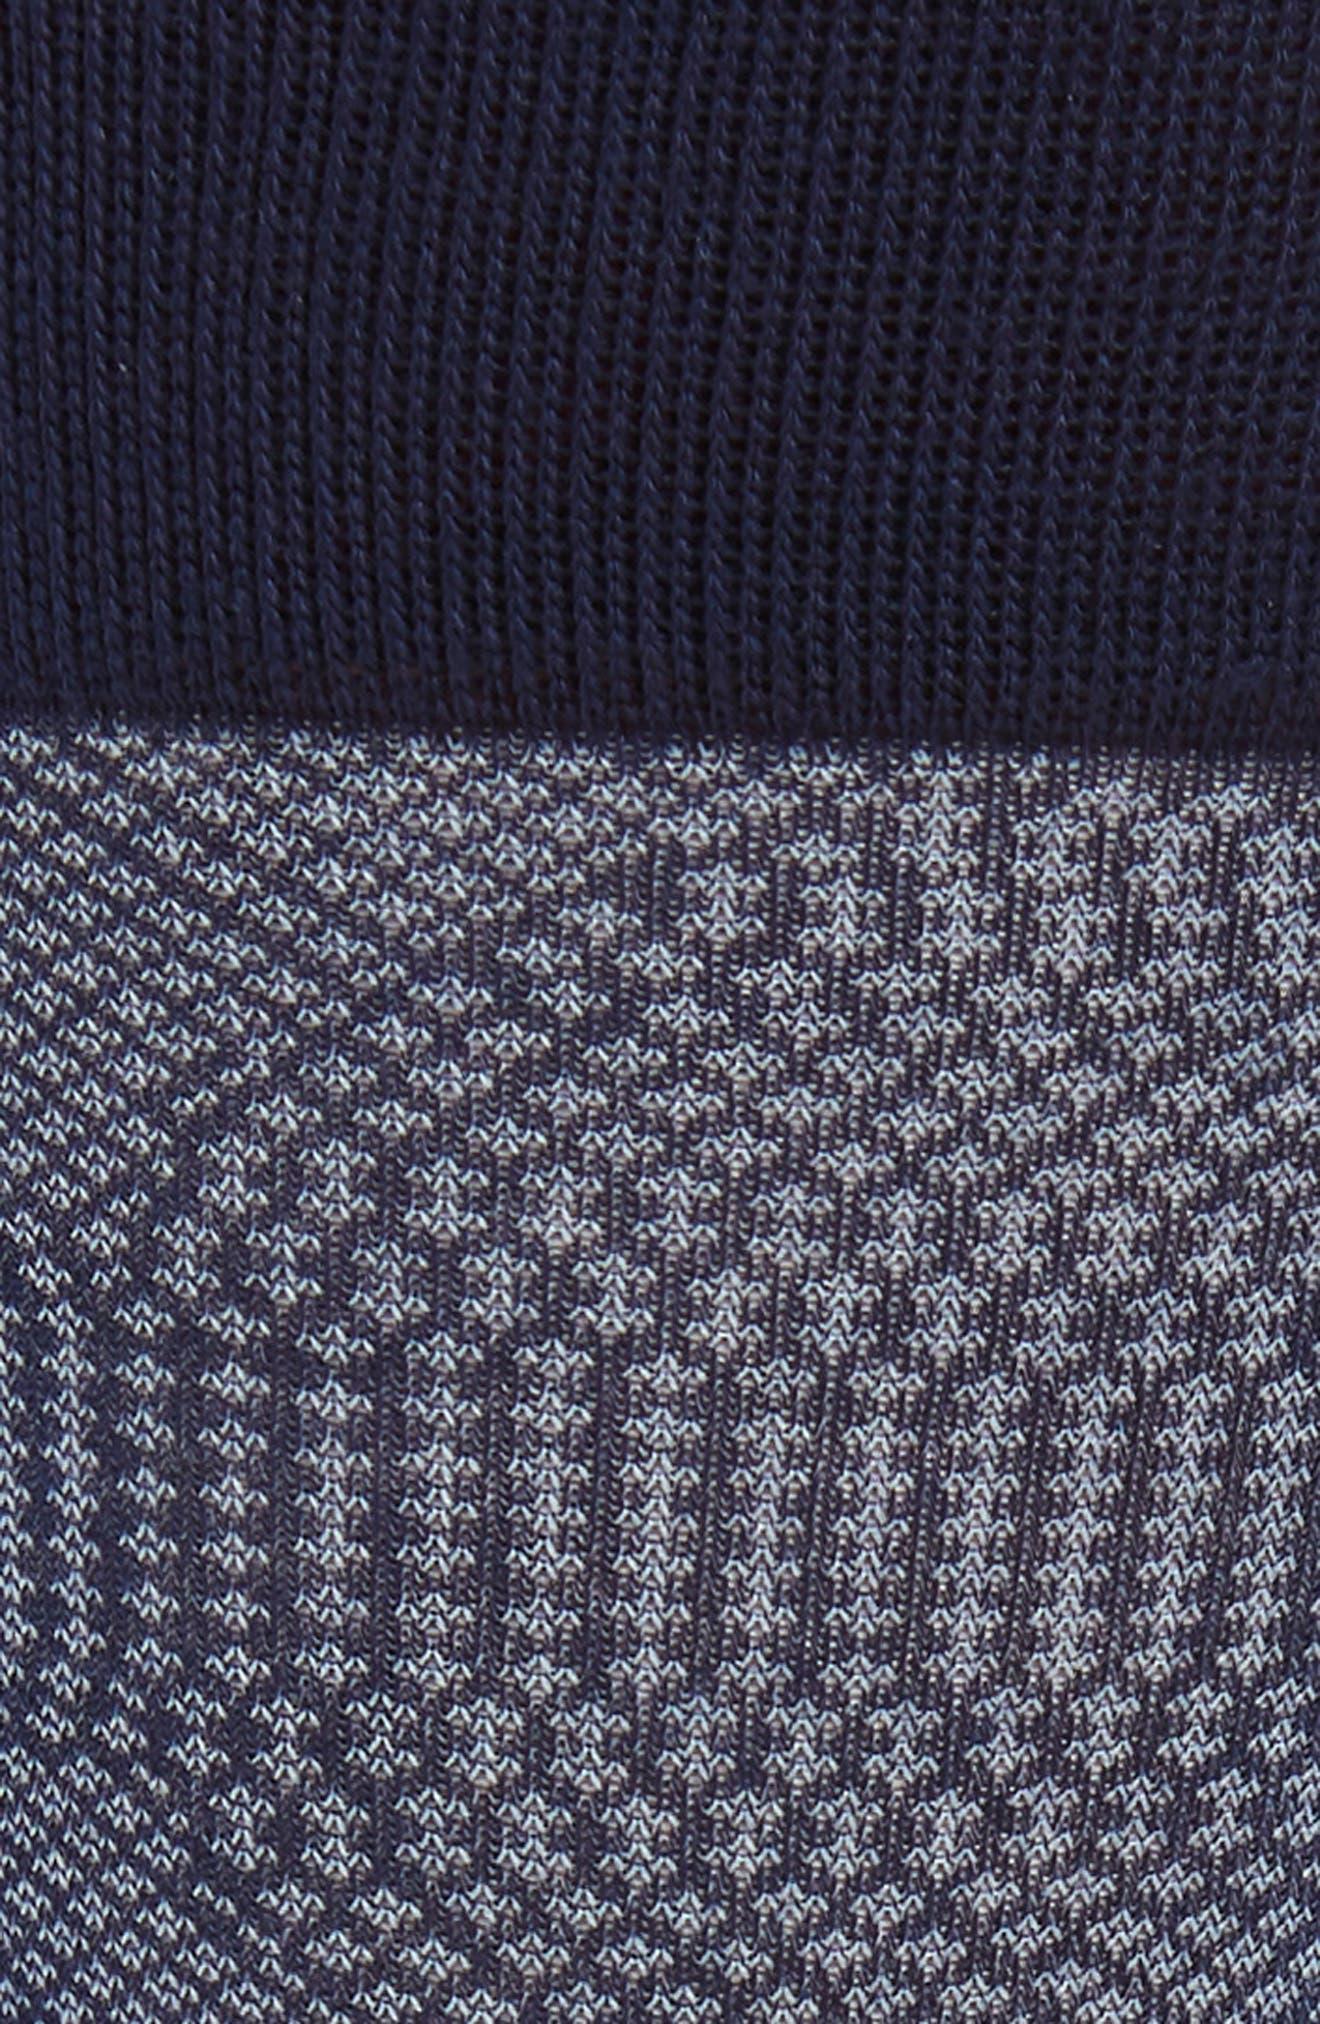 Quatrefoil Solid Socks,                             Alternate thumbnail 2, color,                             410